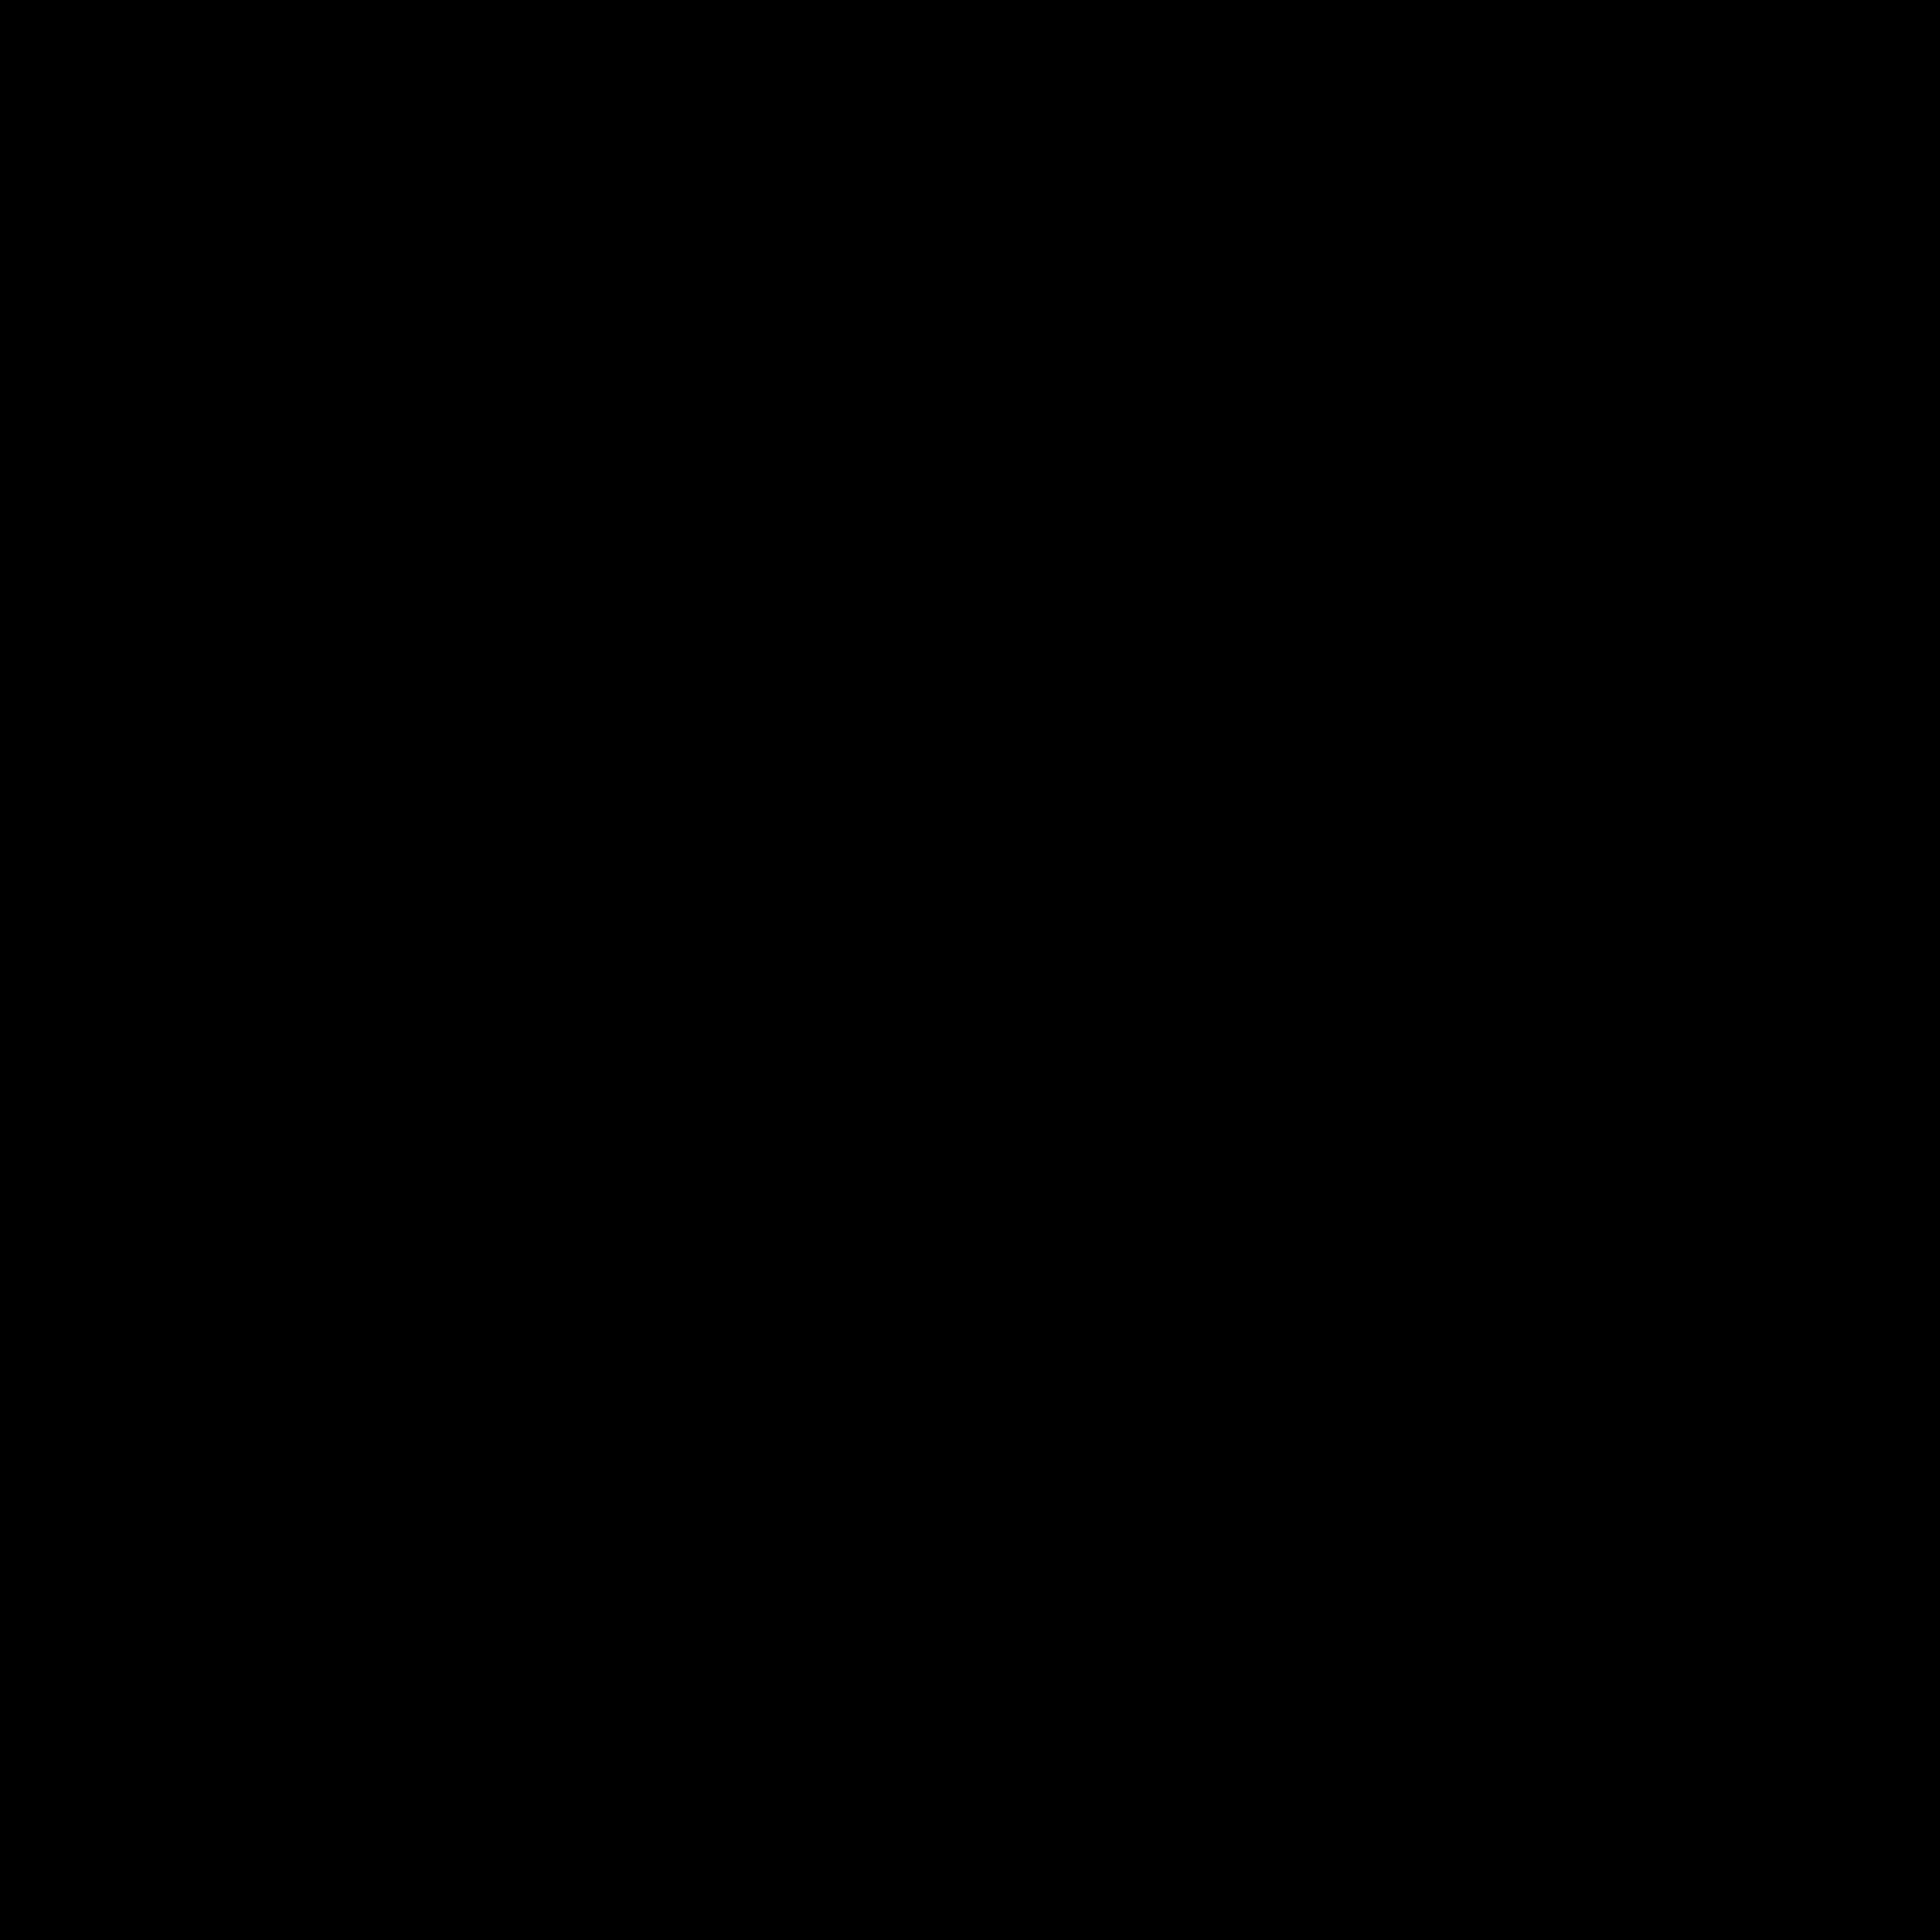 Apollo Tyres Ltd Logo PNG Transparent & SVG Vector.